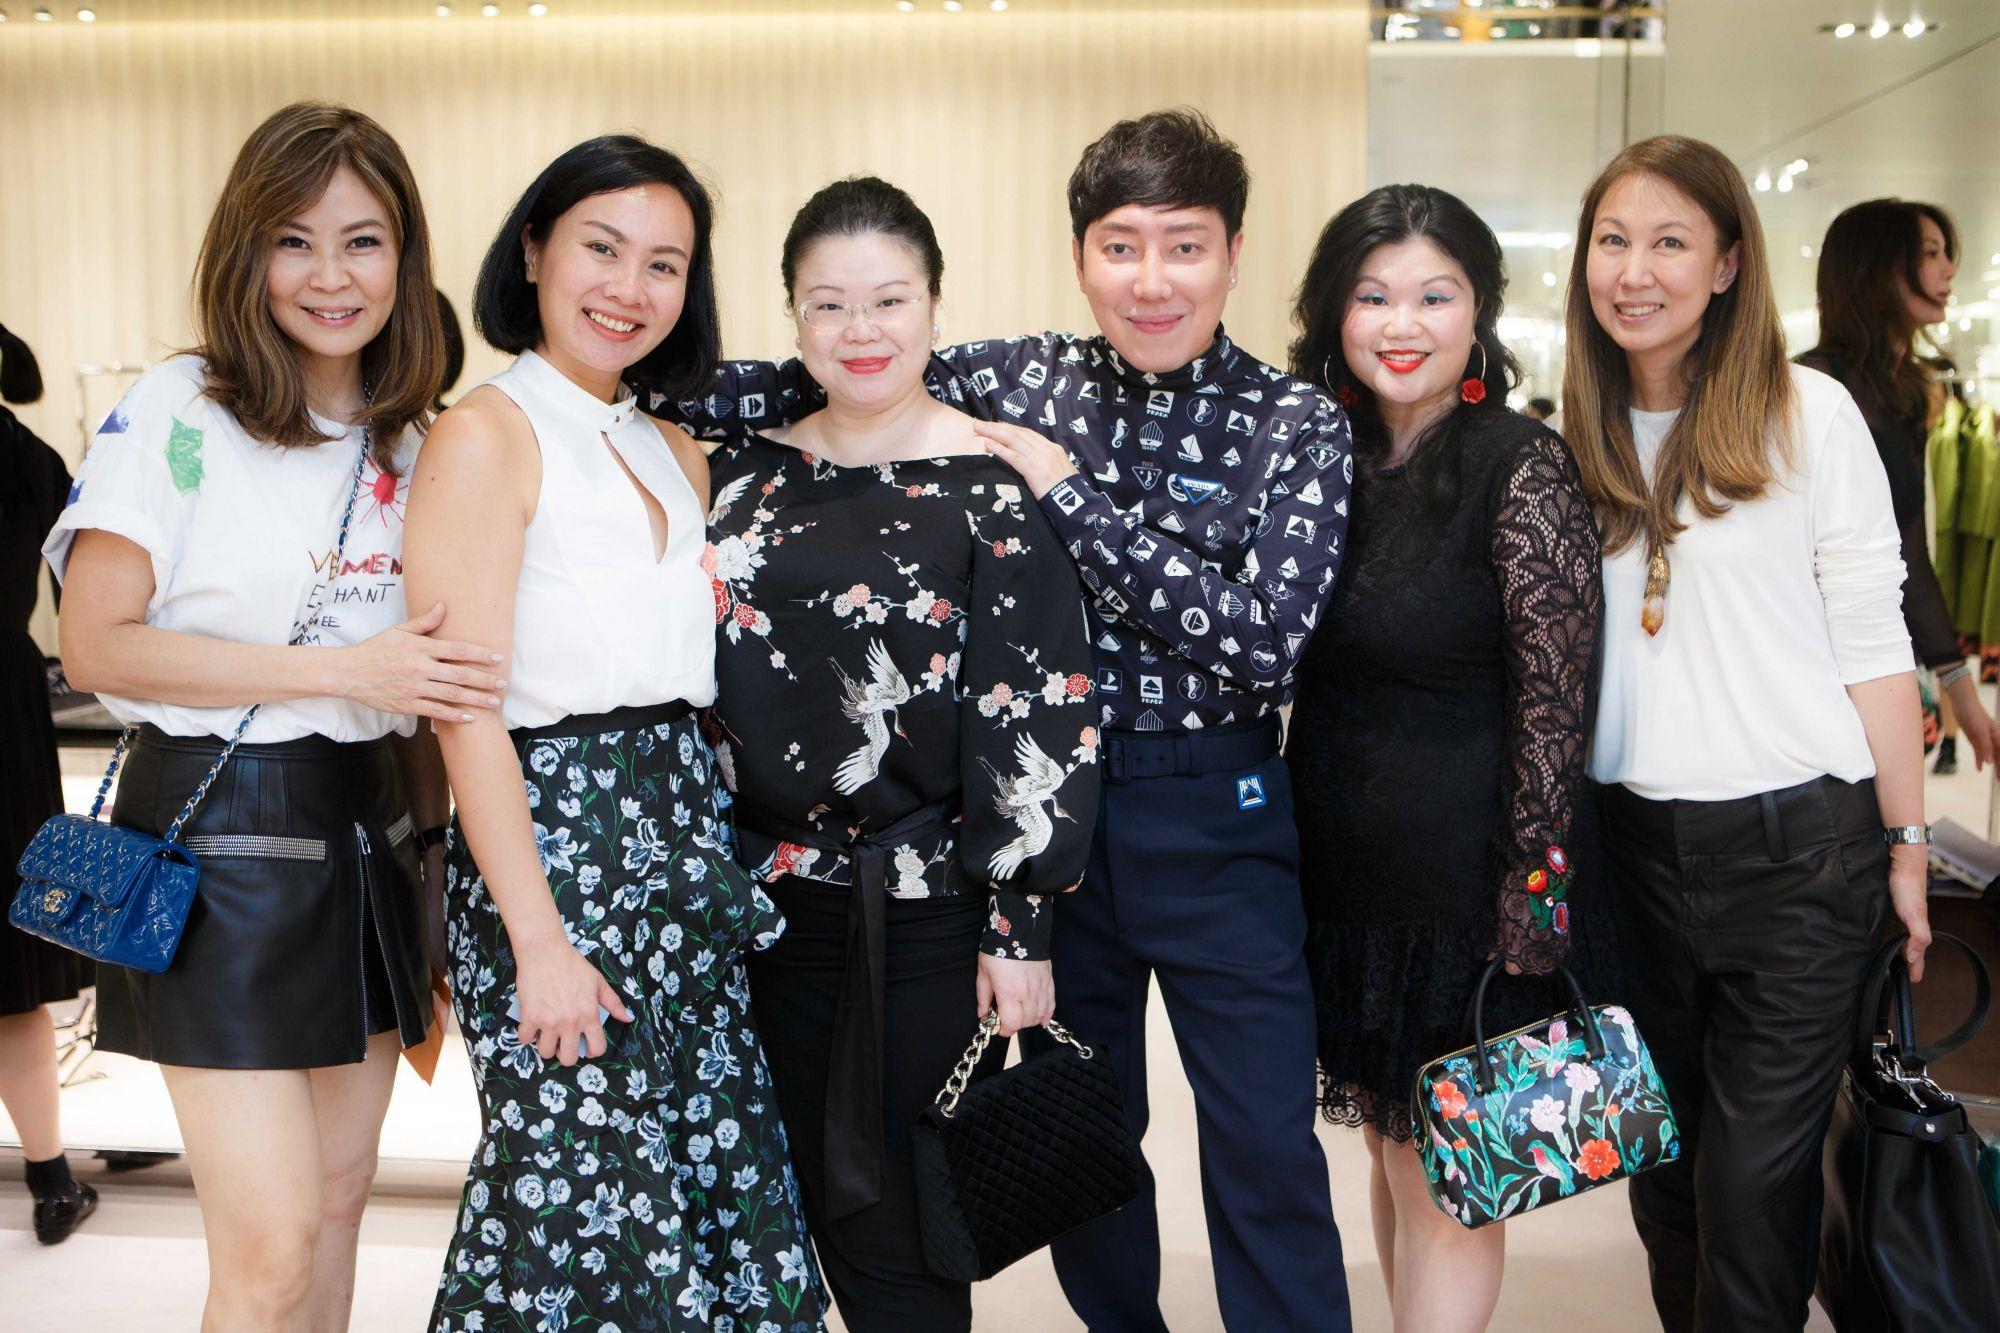 Alicia Thian, Karen Ang, Lam Min Yee, Desmond Lim, Lam Tse Yi, June Rin